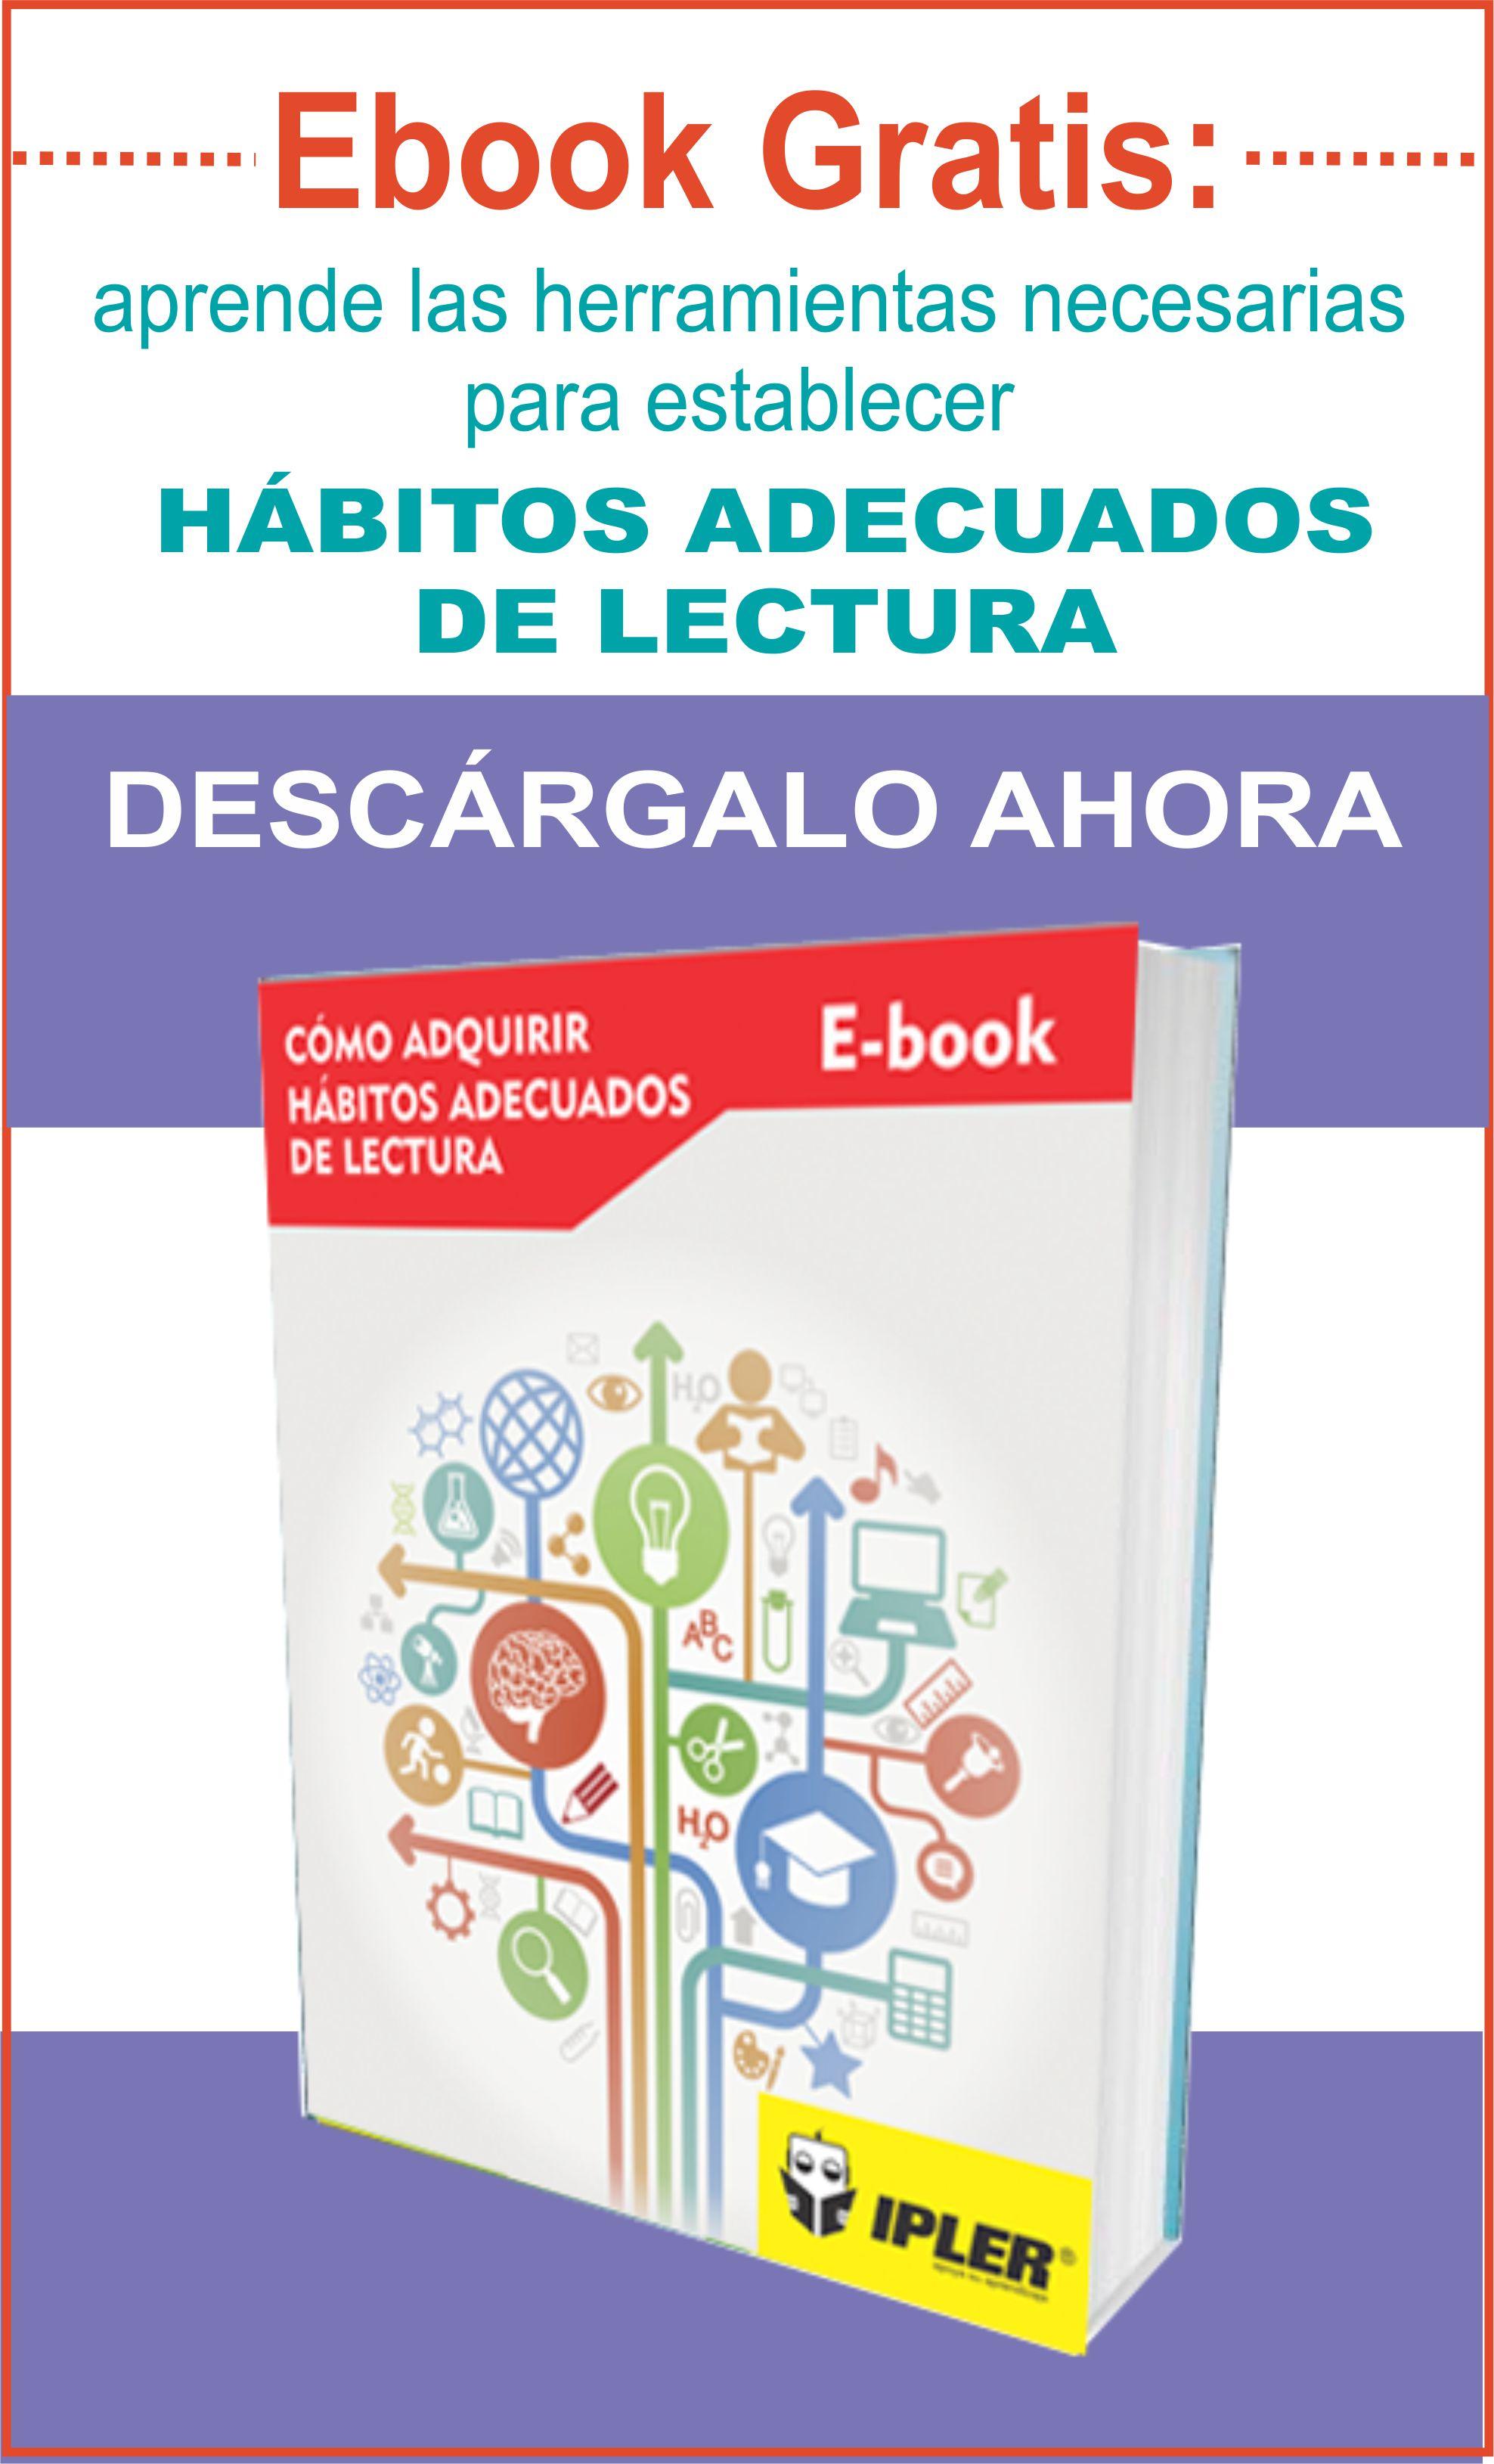 habitos-lectura-banner-2